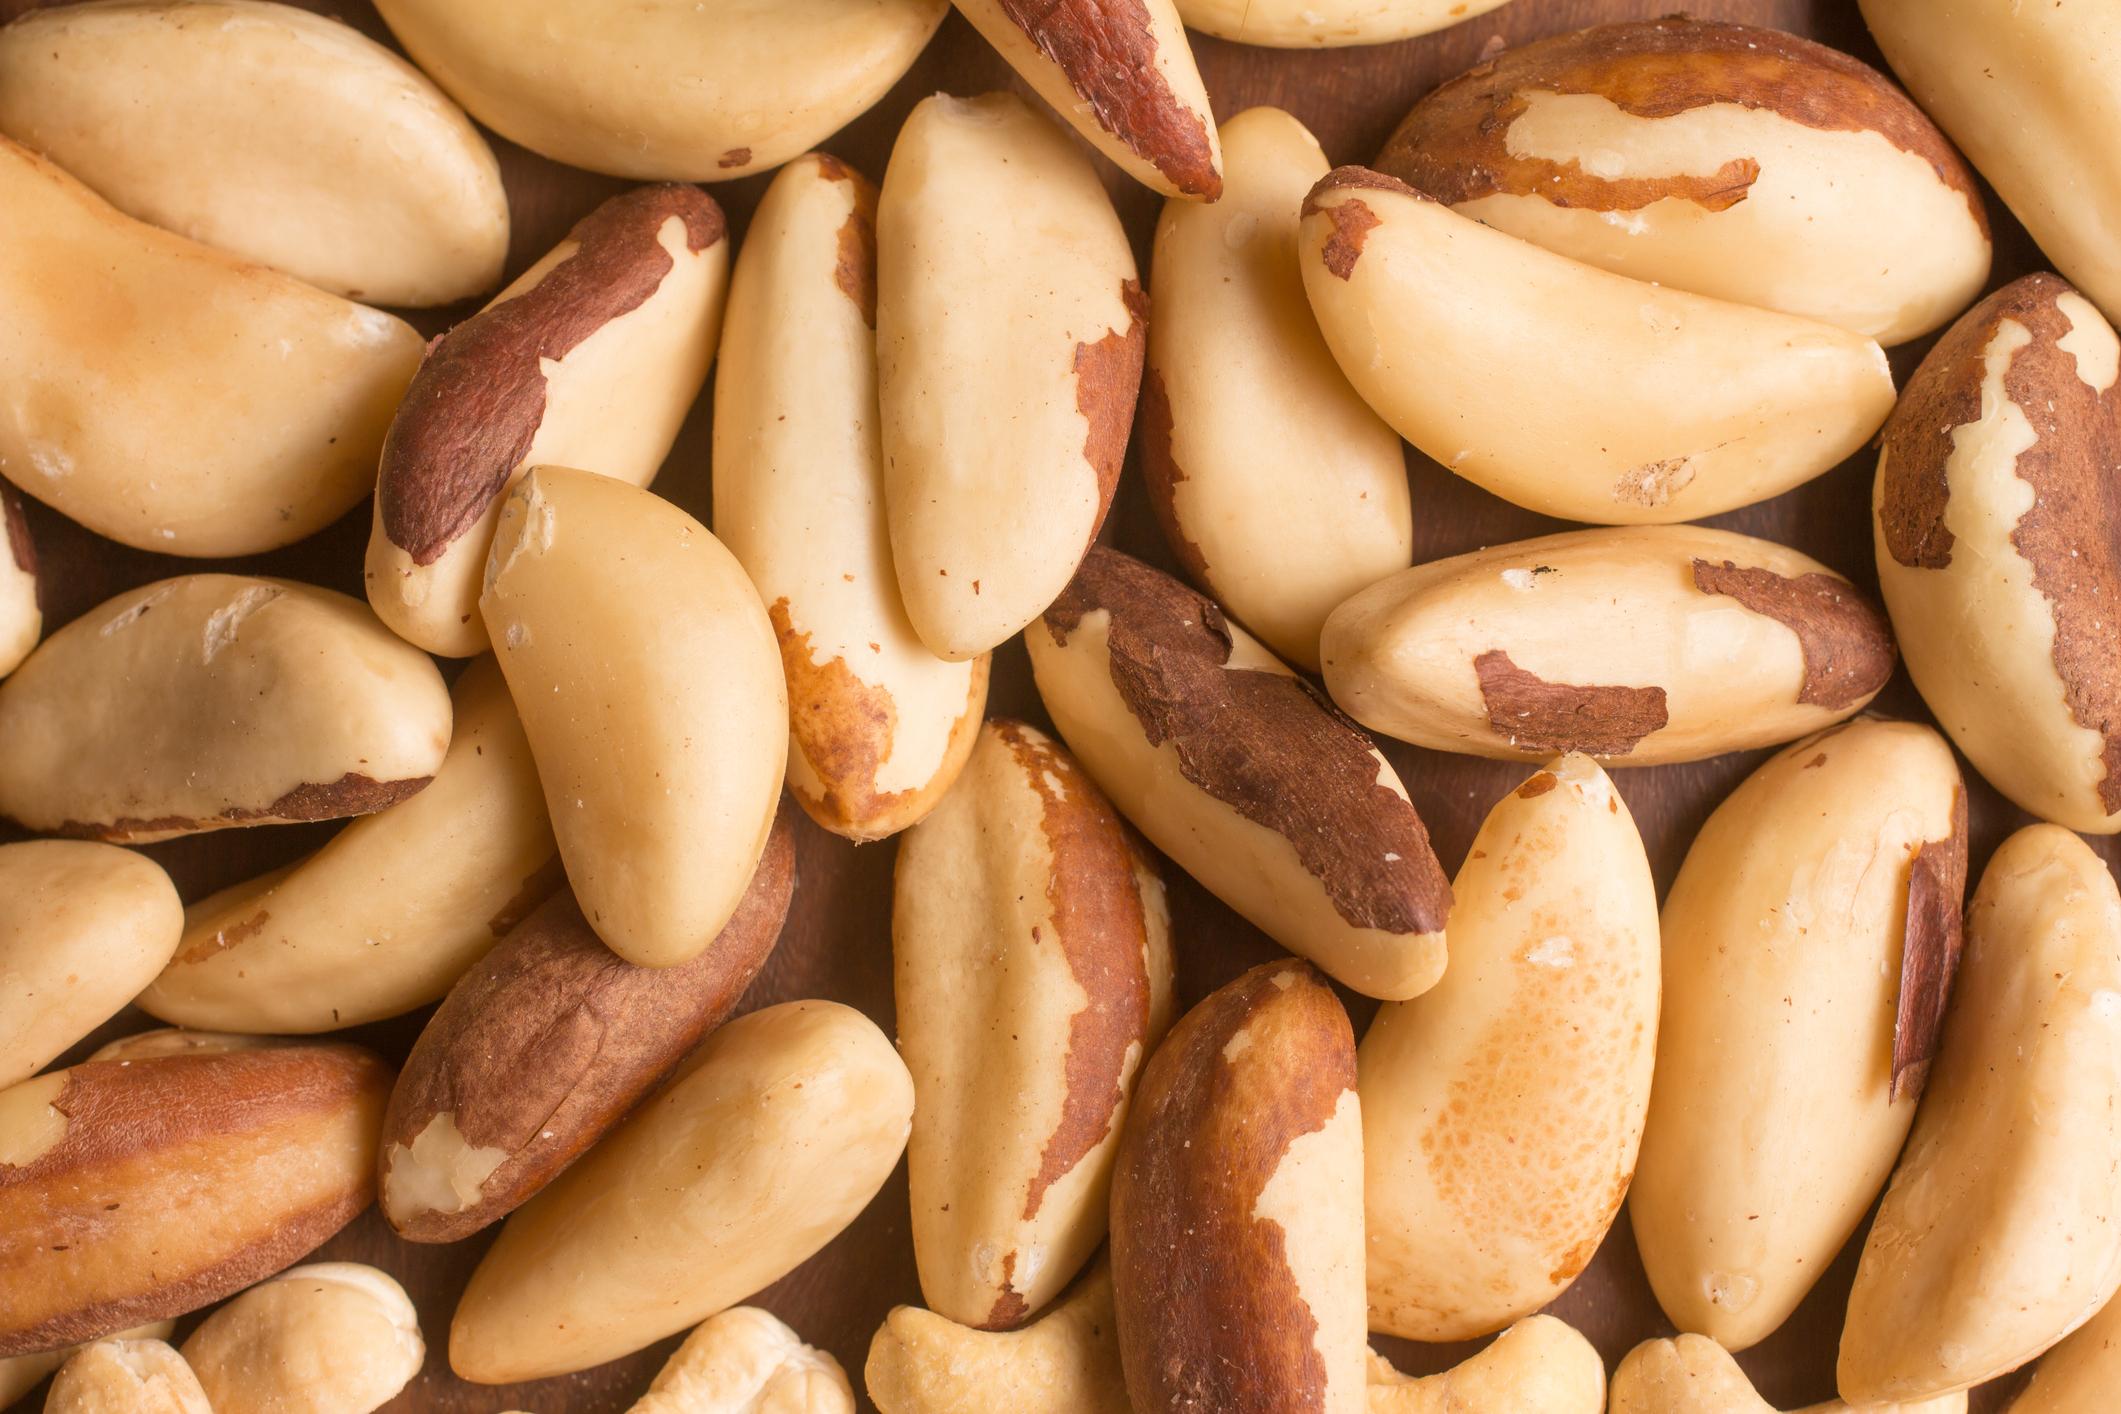 High Quality Ellagic Acid Selenium Mineral Raw Organic Brazil Nut Large